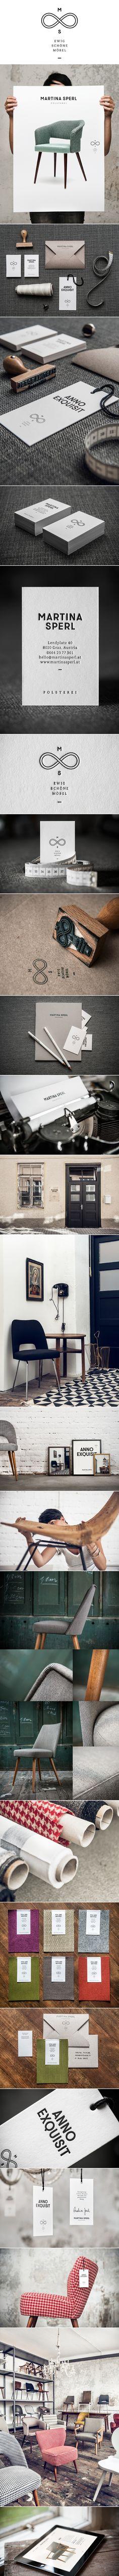 Corporate graphic design furniture chair fabric letterpress business card Handmade Furniture - http://amzn.to/2iwpdj4